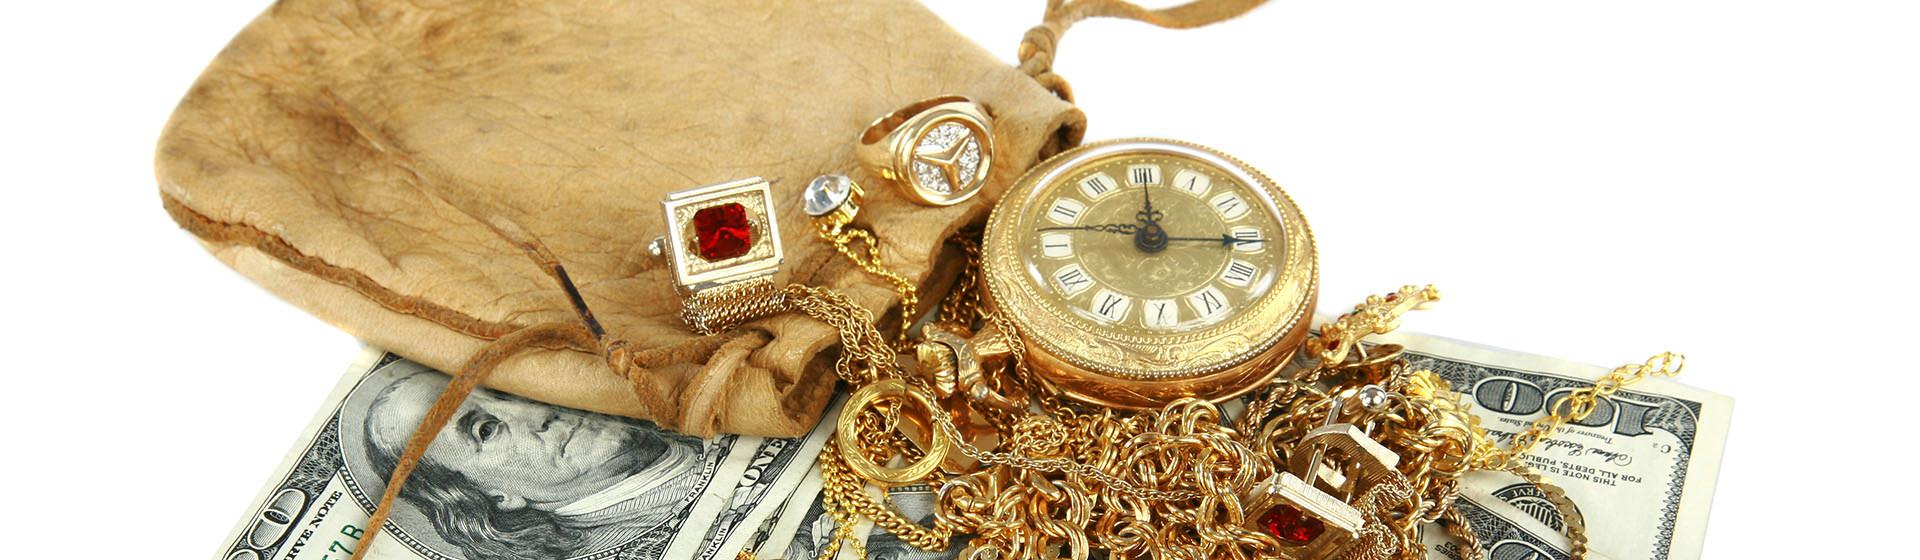 Compro Oro Tivoli